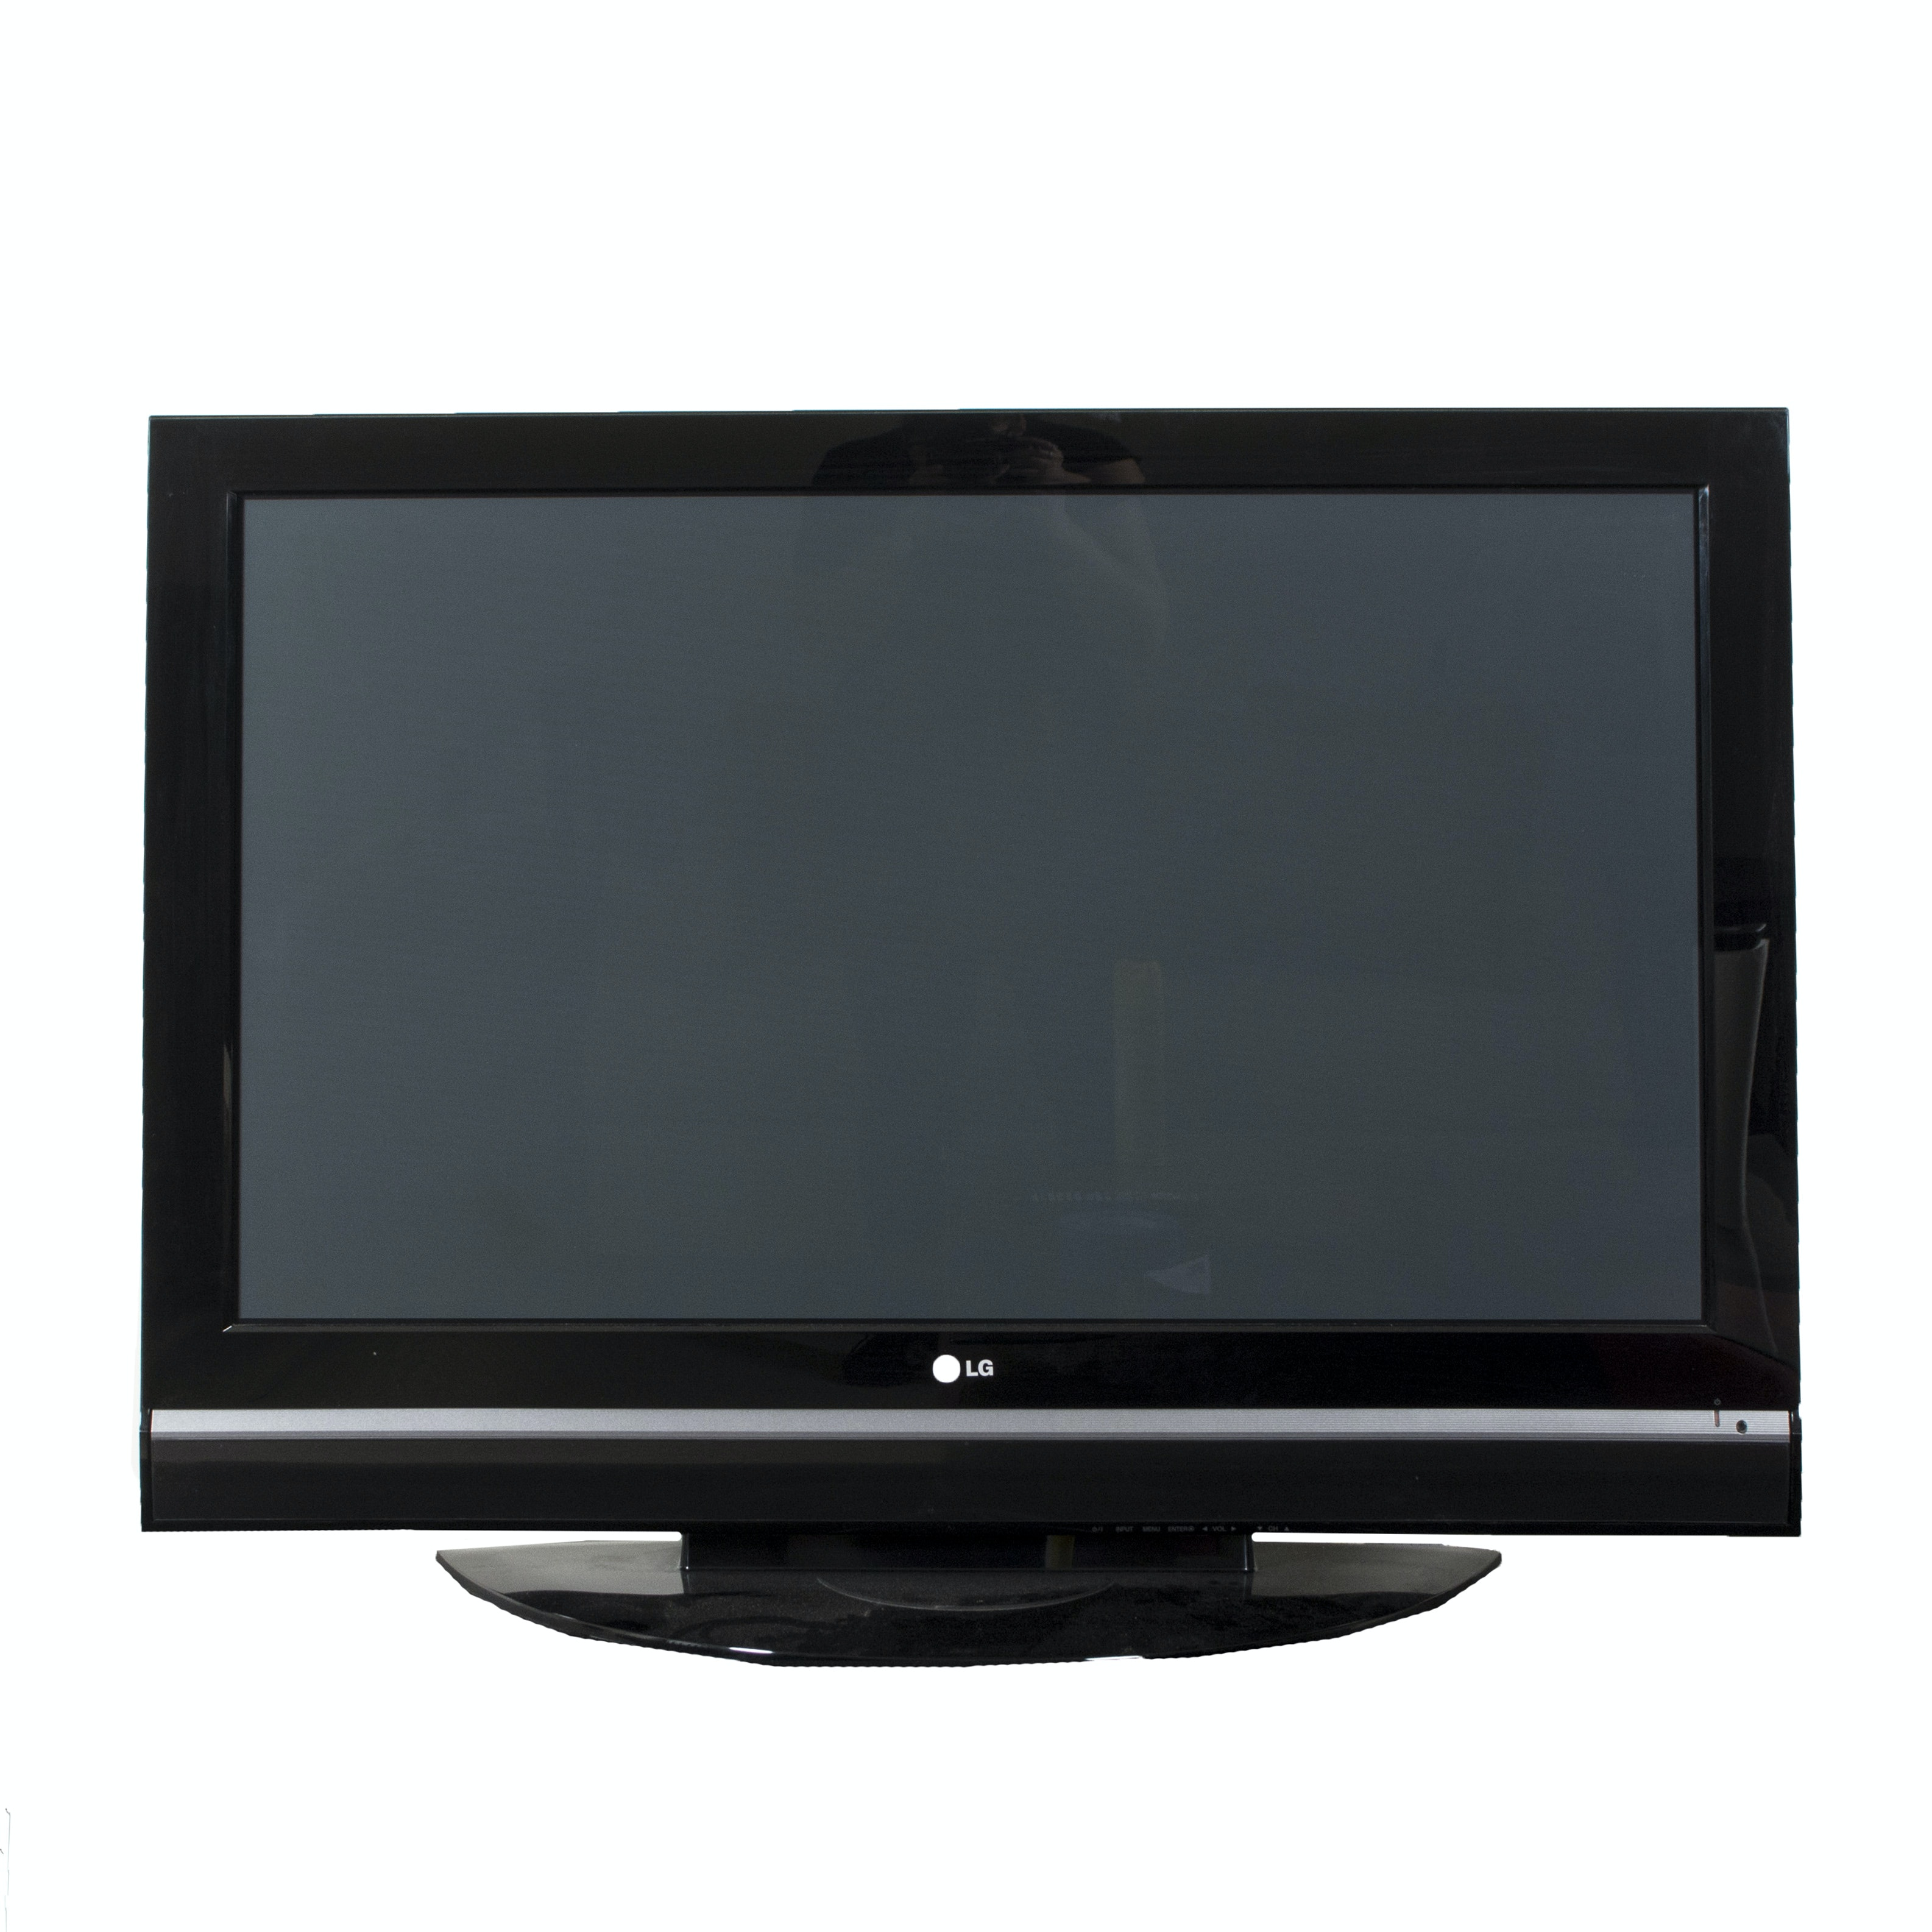 lg plasma 42pc5d manual sample user manual u2022 rh userguideme today lg plasma tv 42 inch user manual Samsung 50 Inch Plasma TV